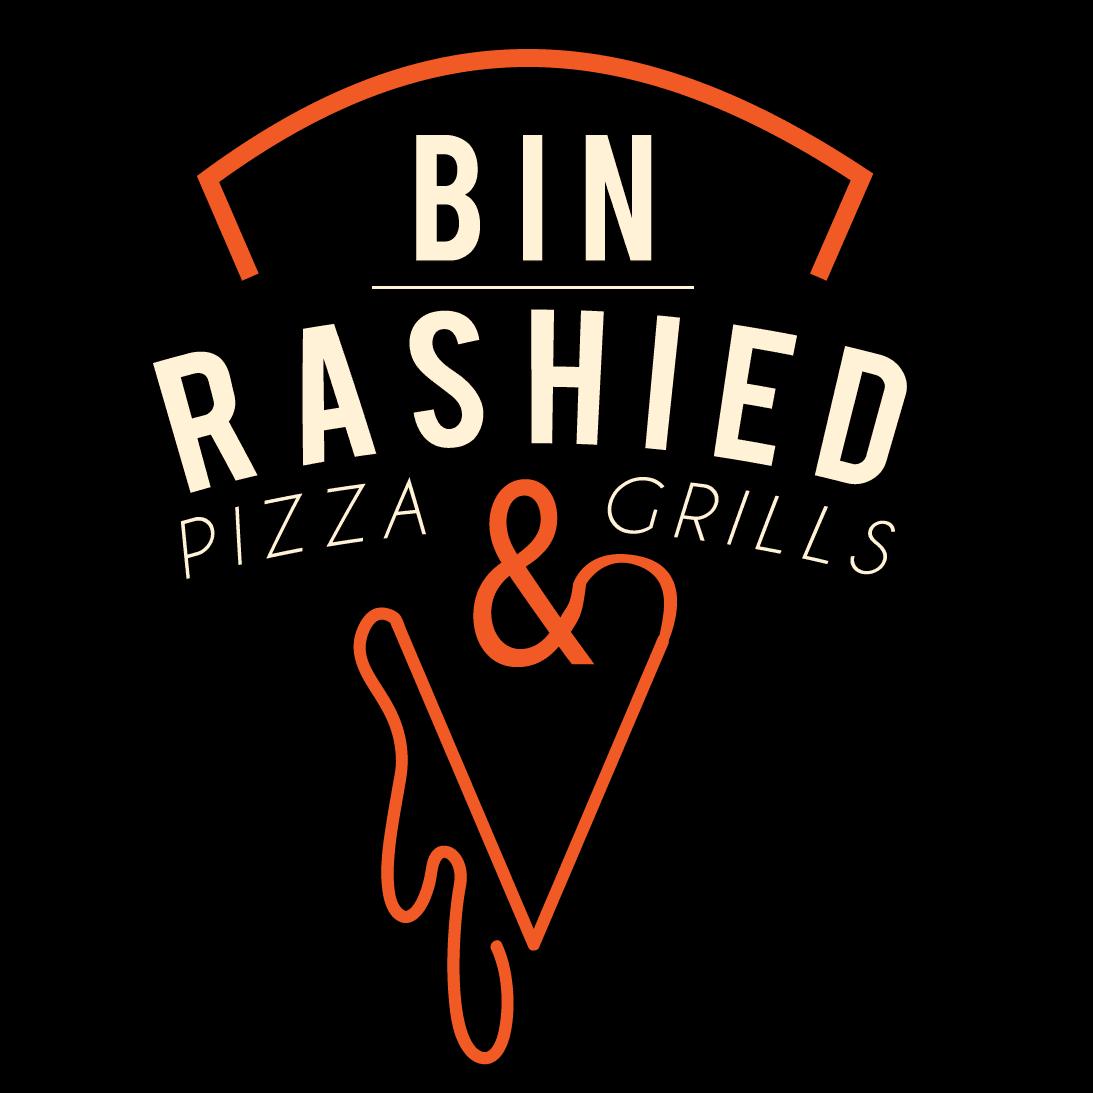 Bin Rashied Pizza and Grills logo